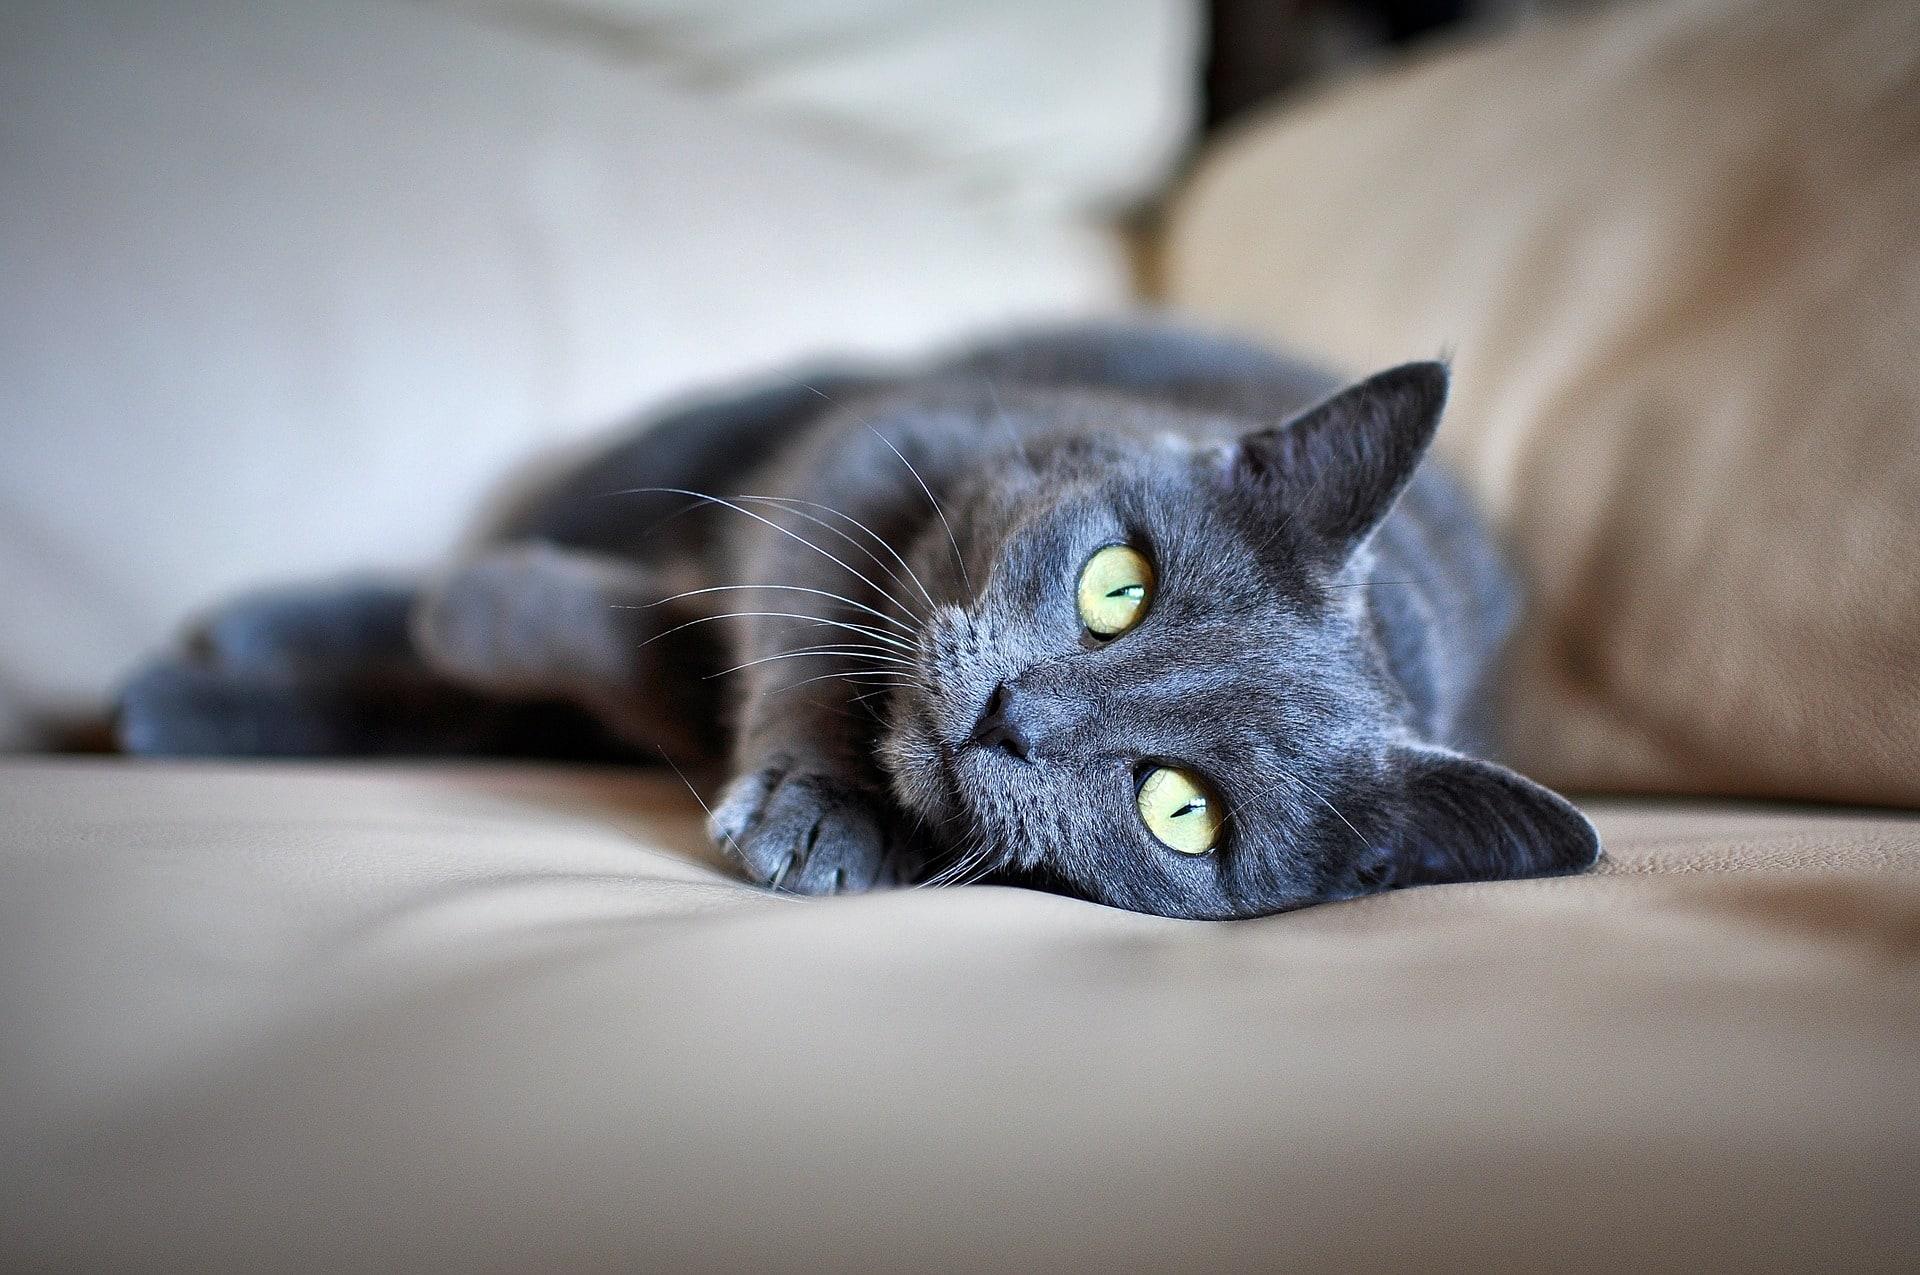 Self Medicating Your Pet The Healthy Club Counterpain Medium Cat 1377984 1920